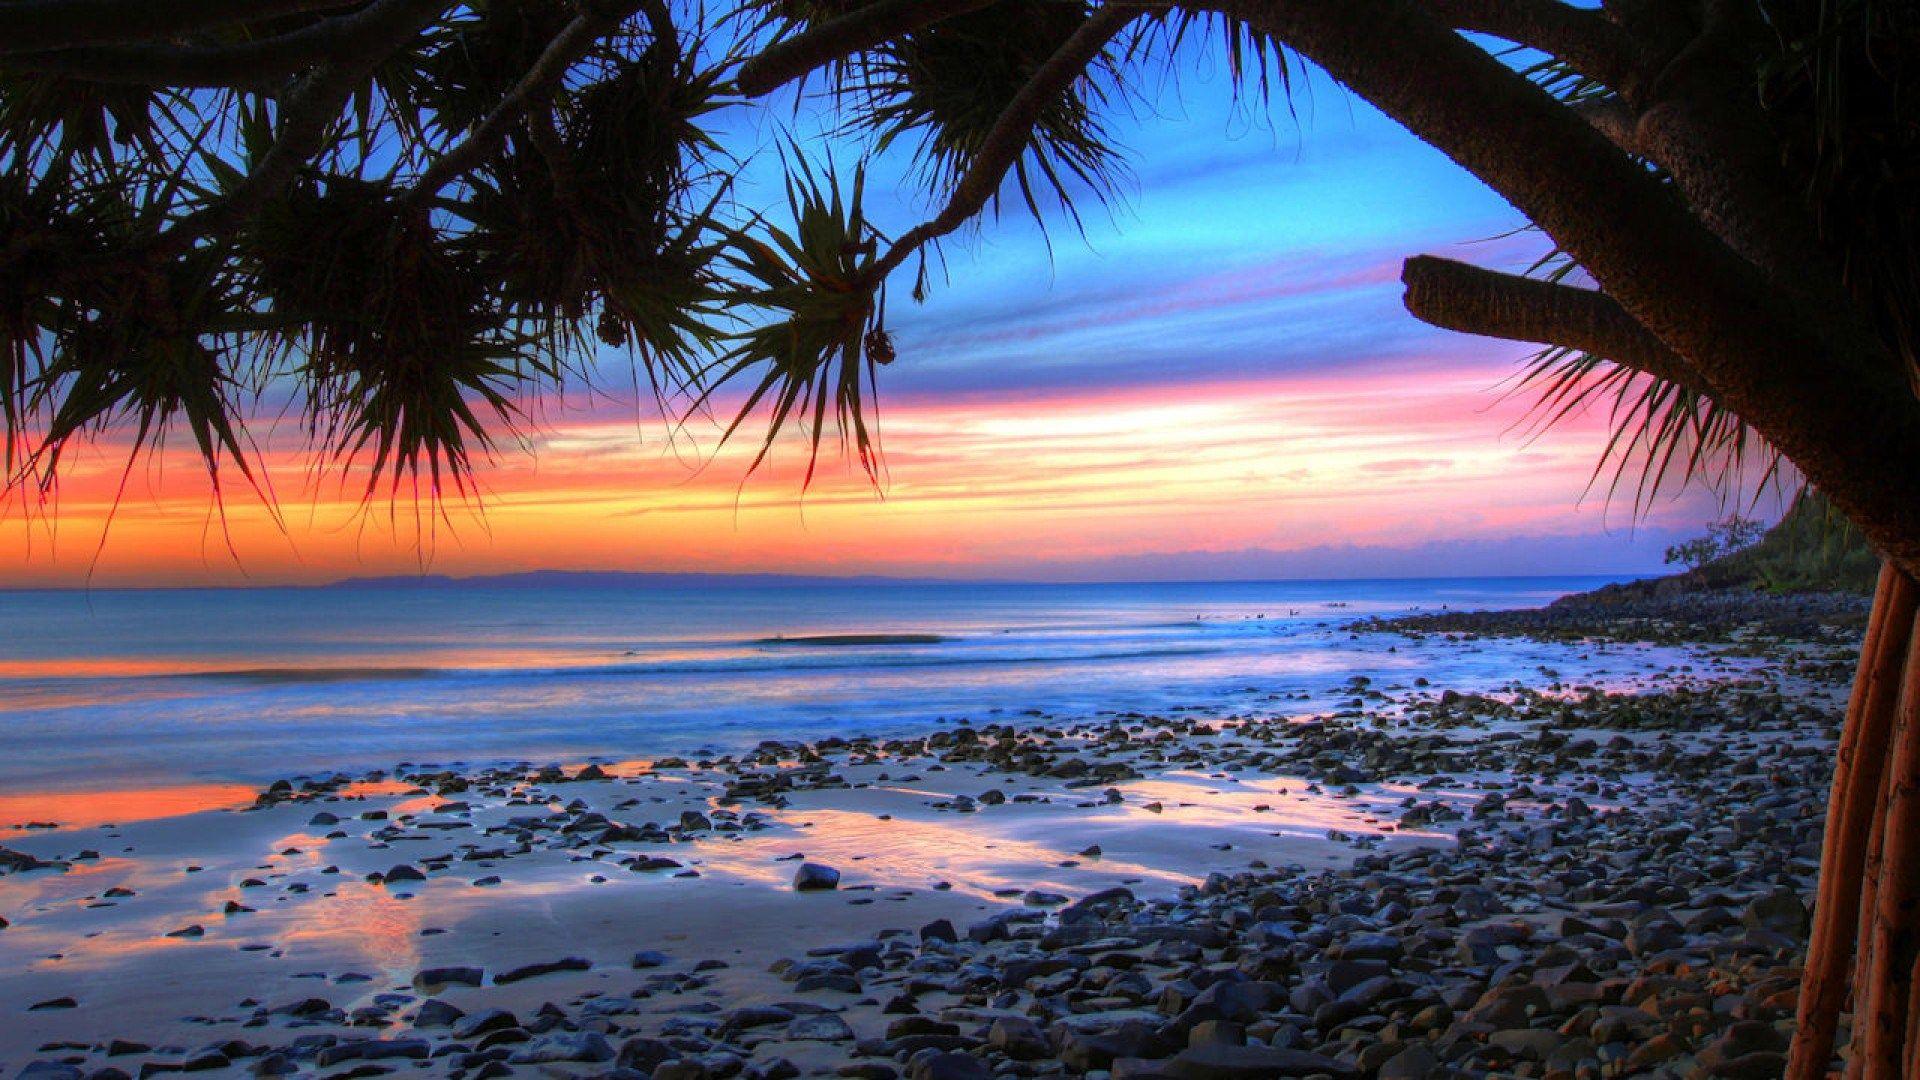 Beautiful Beach Images Hd Nature: Beautiful Australian Beach HD [1920 1080]